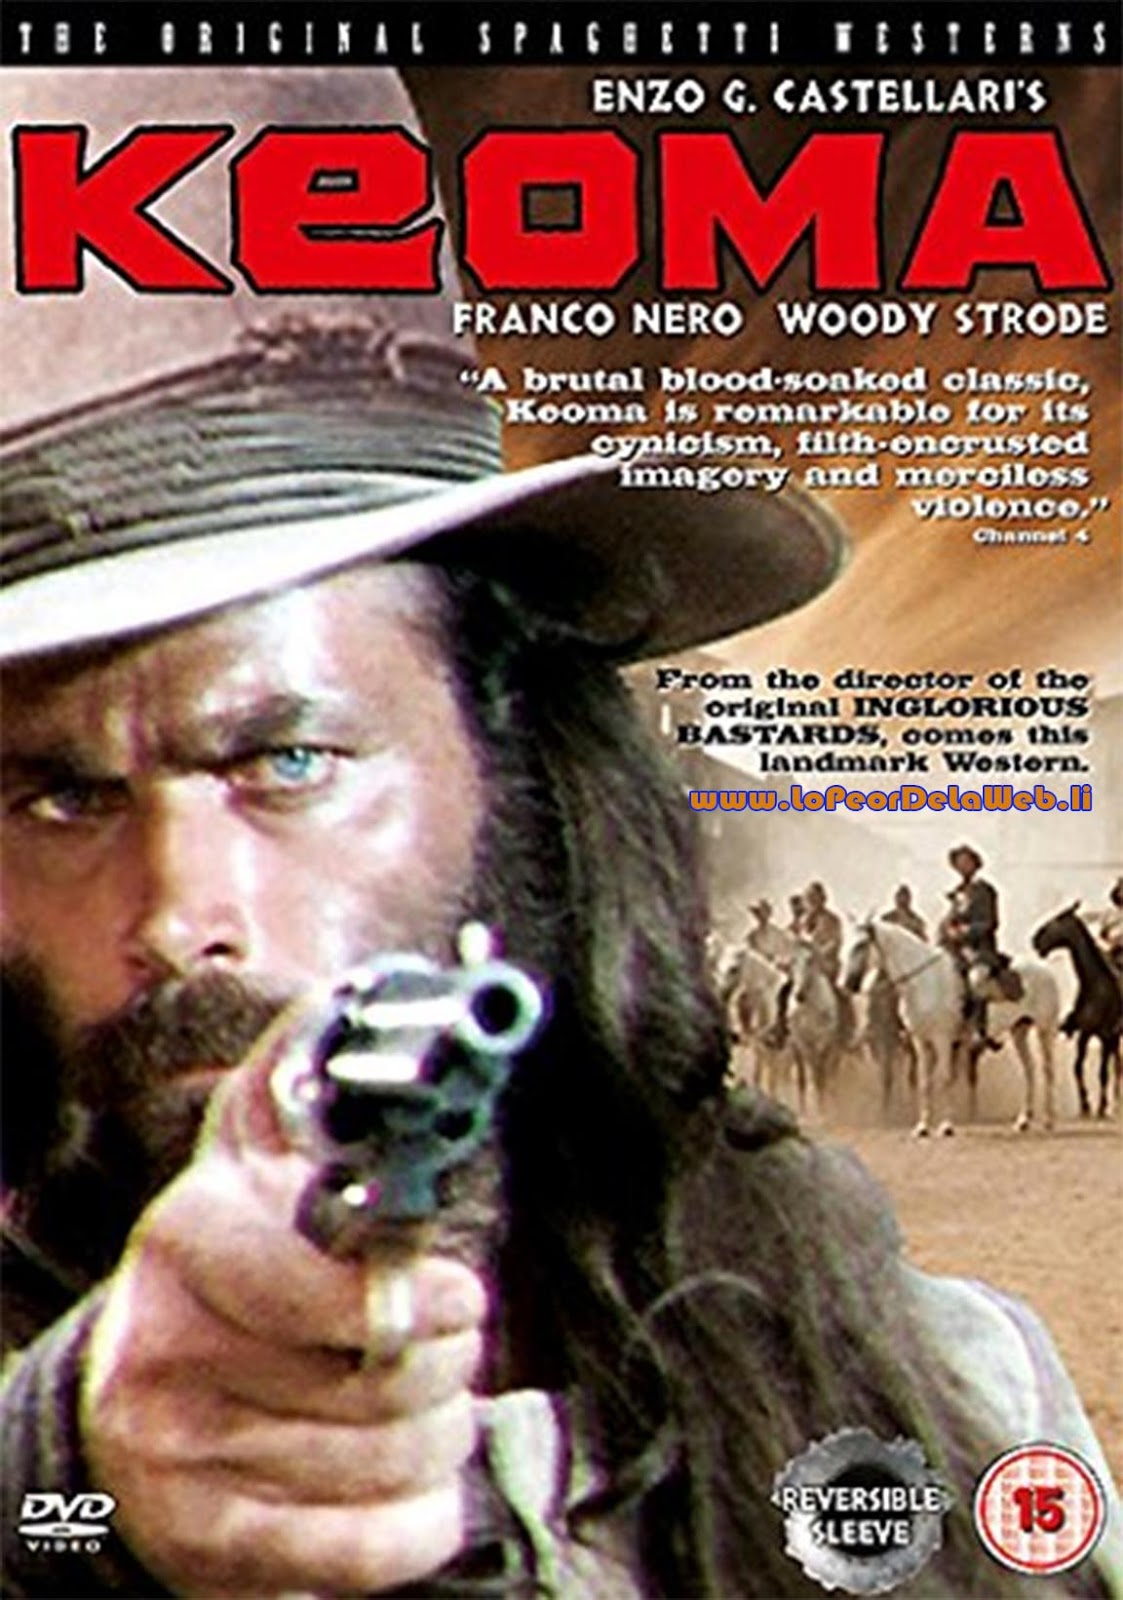 Keoma (1976 - Franco Nero - S. Western - Dual / Subt)